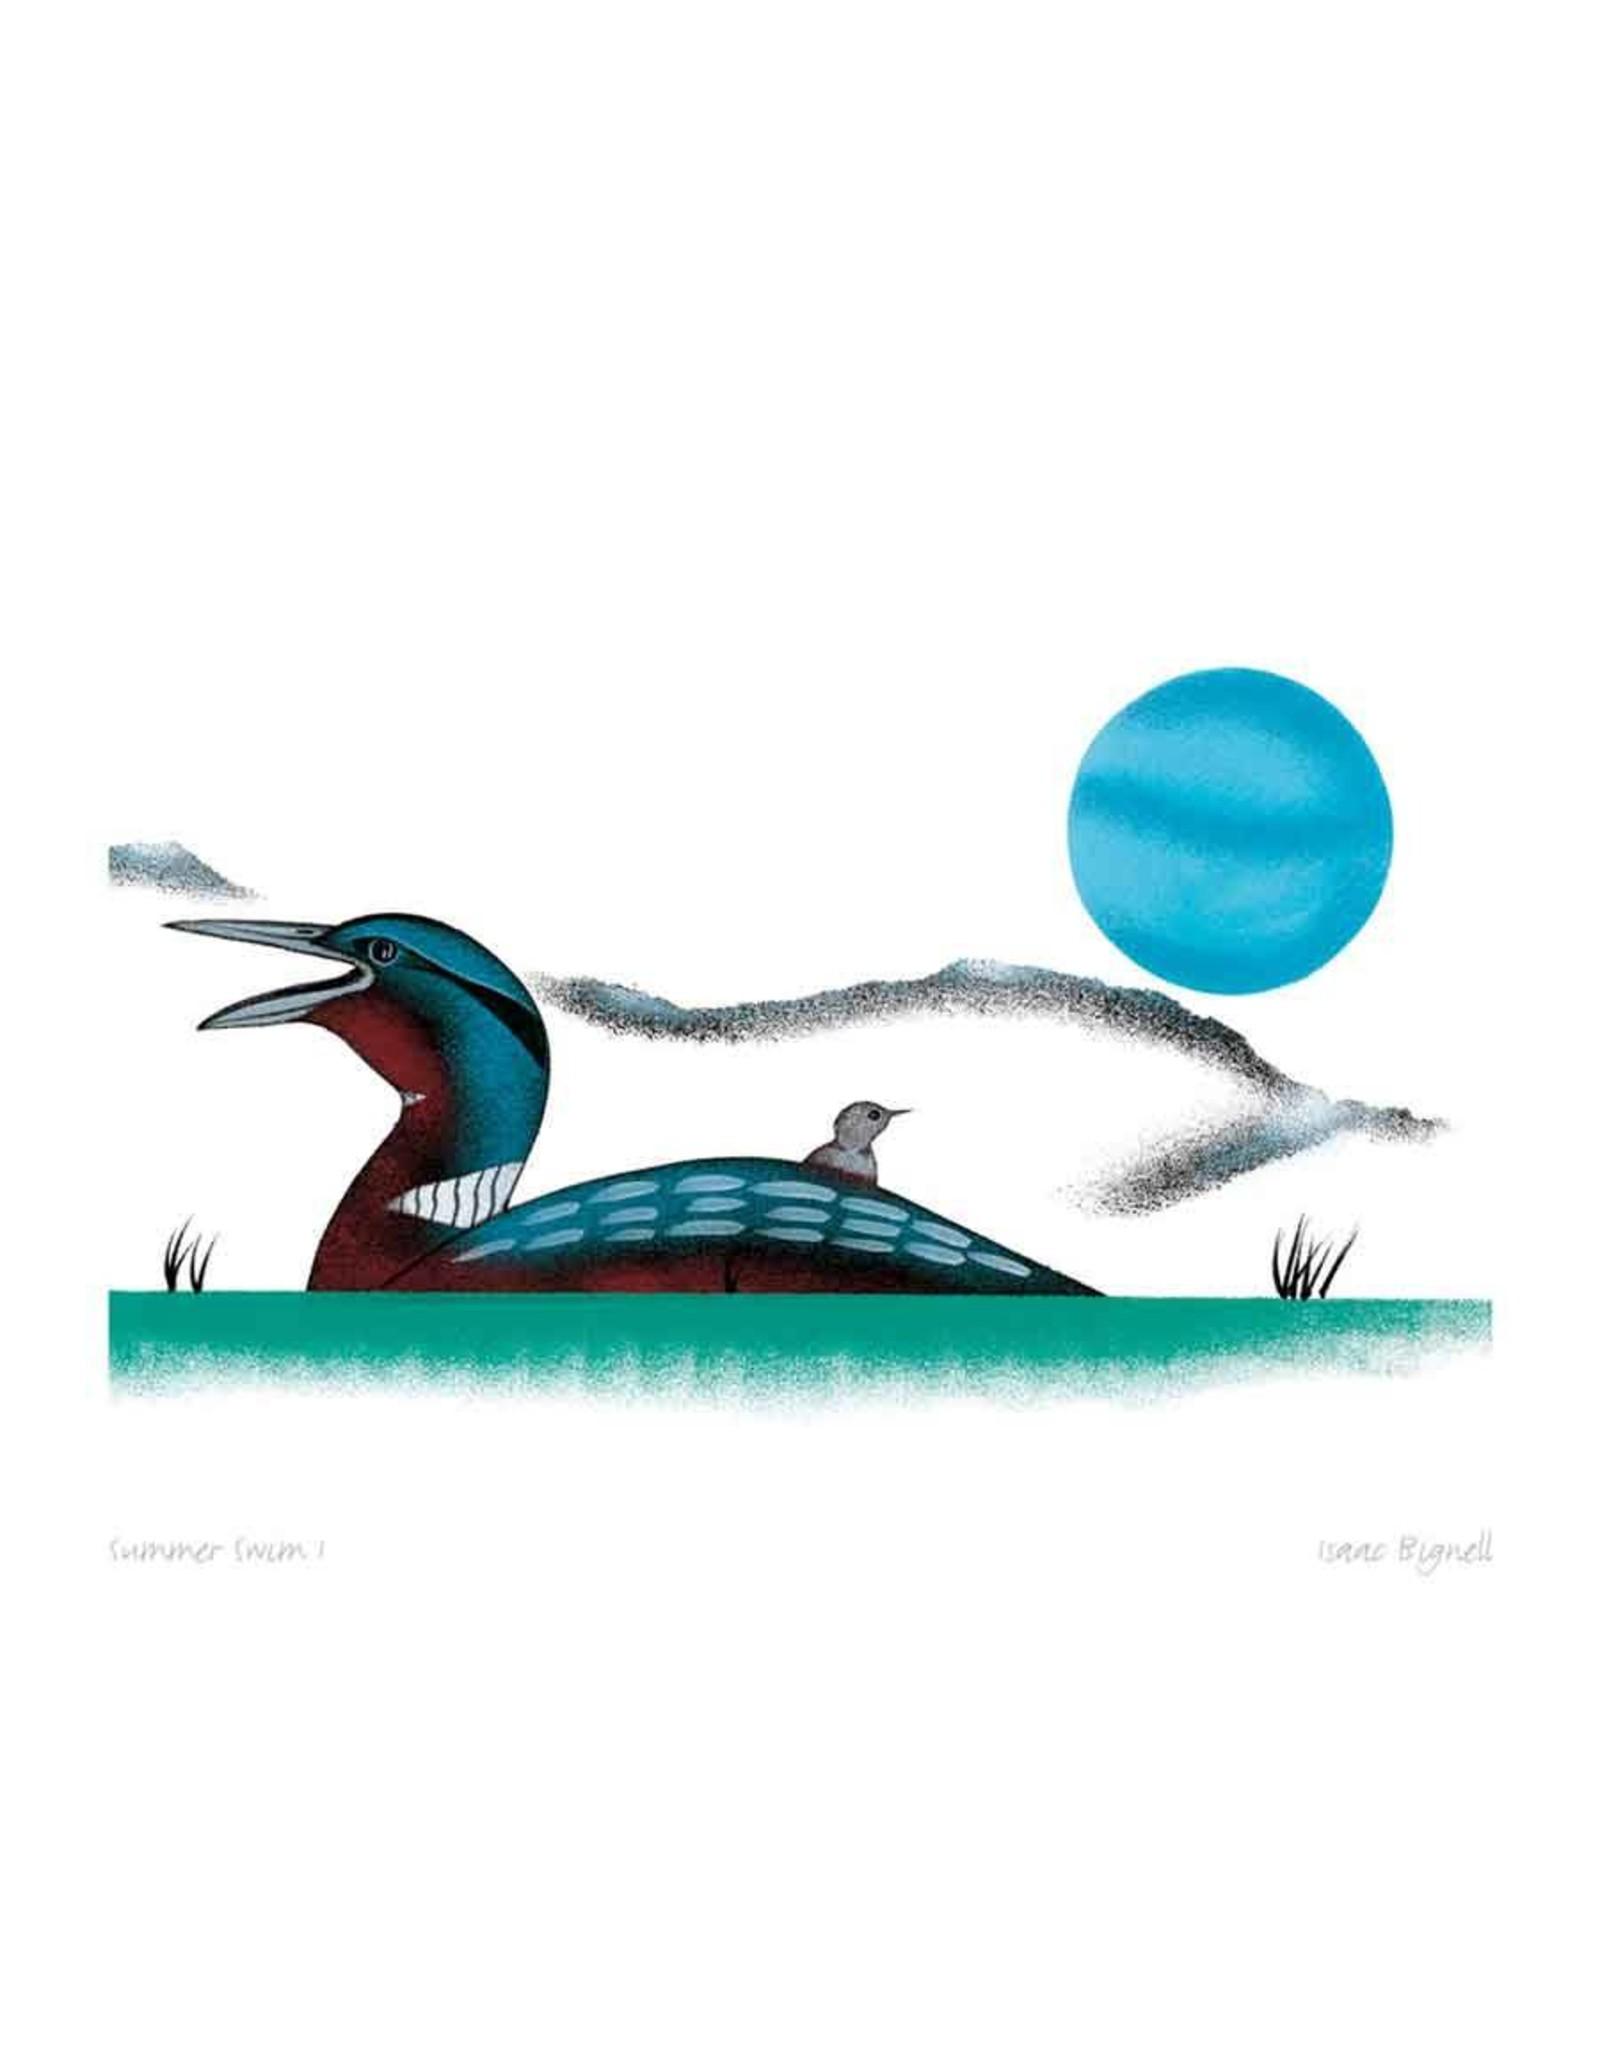 Summer Swim I by Isaac Bignell Card